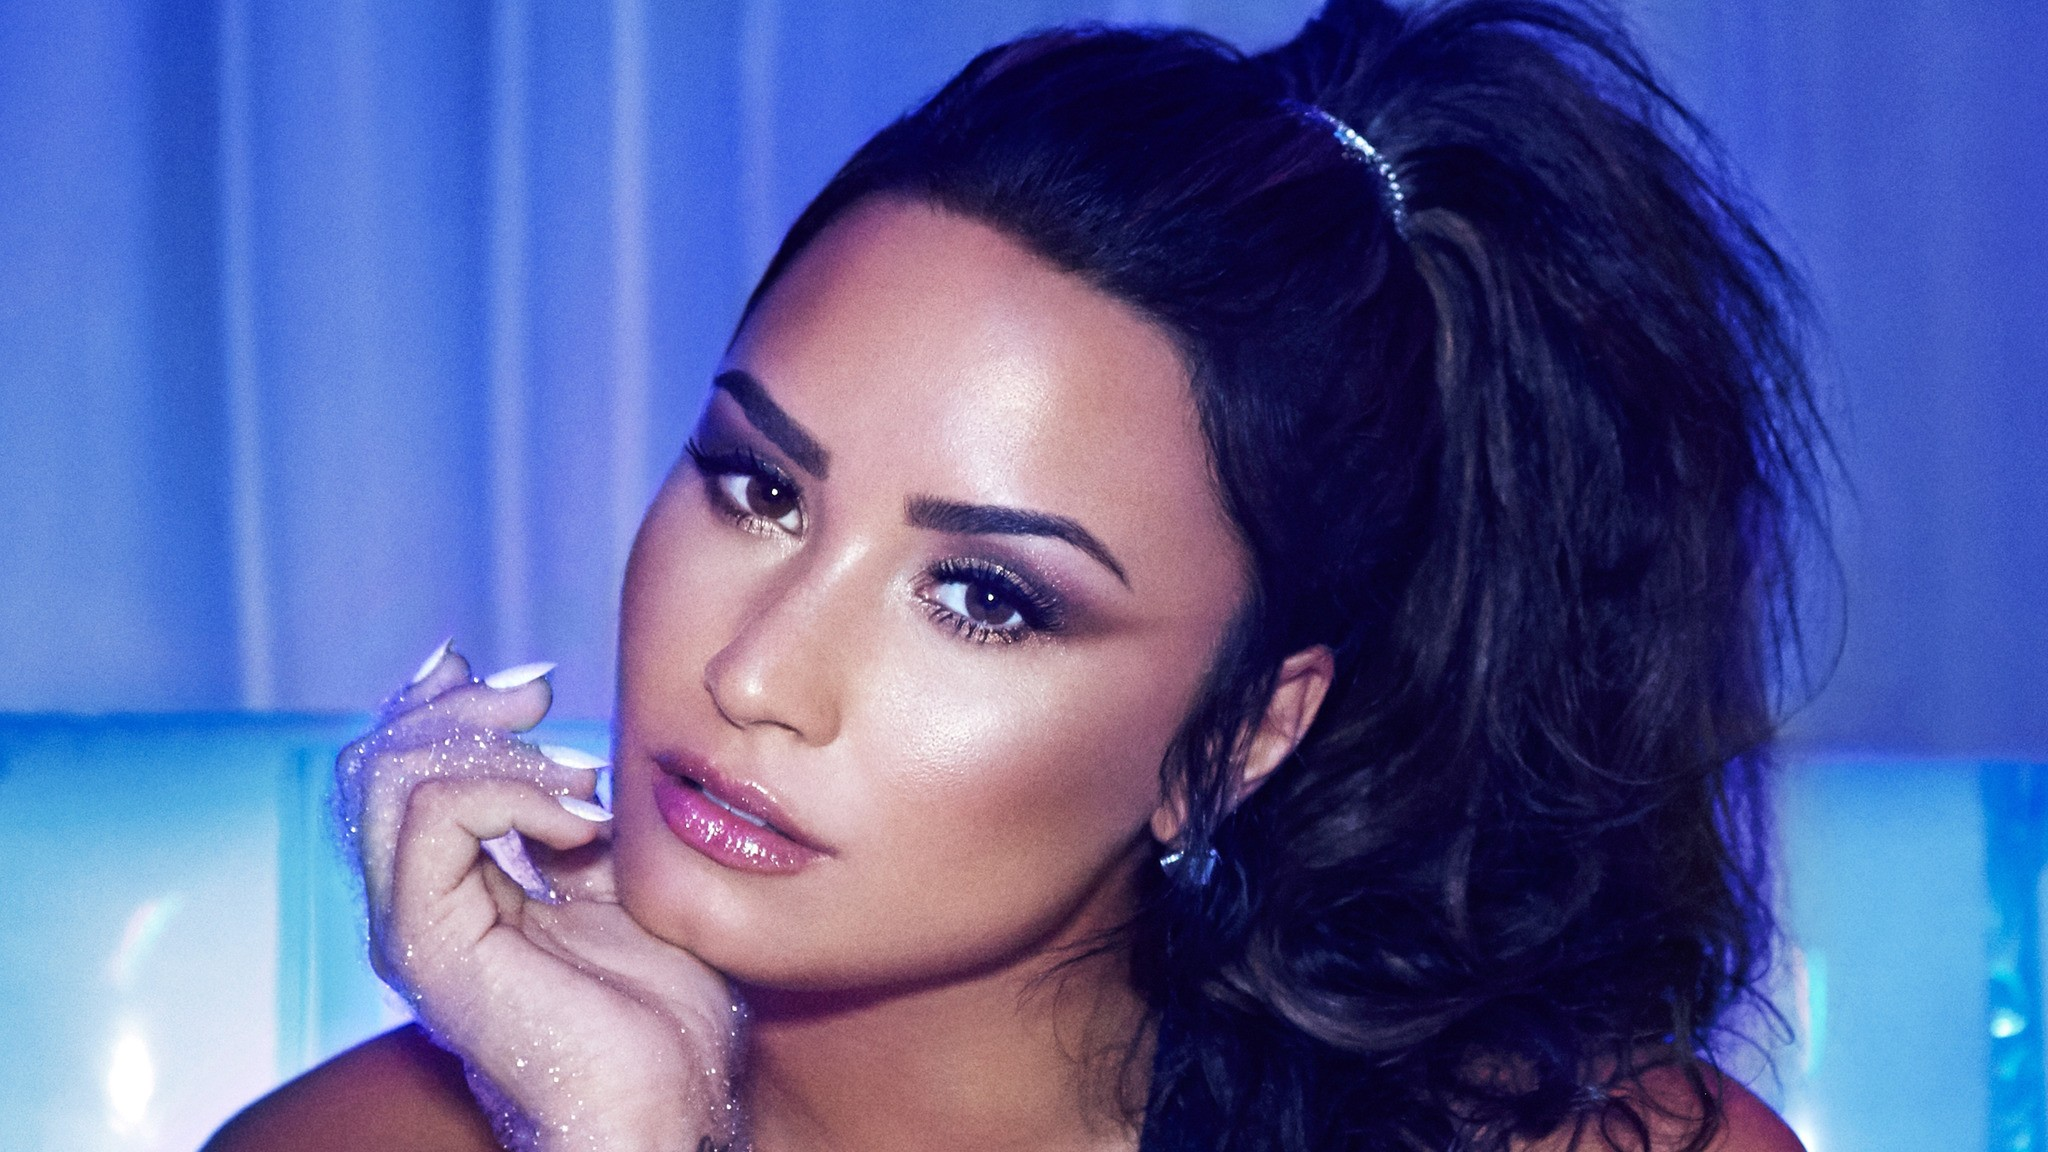 celebrities with mental illness 09, Demi Lovato